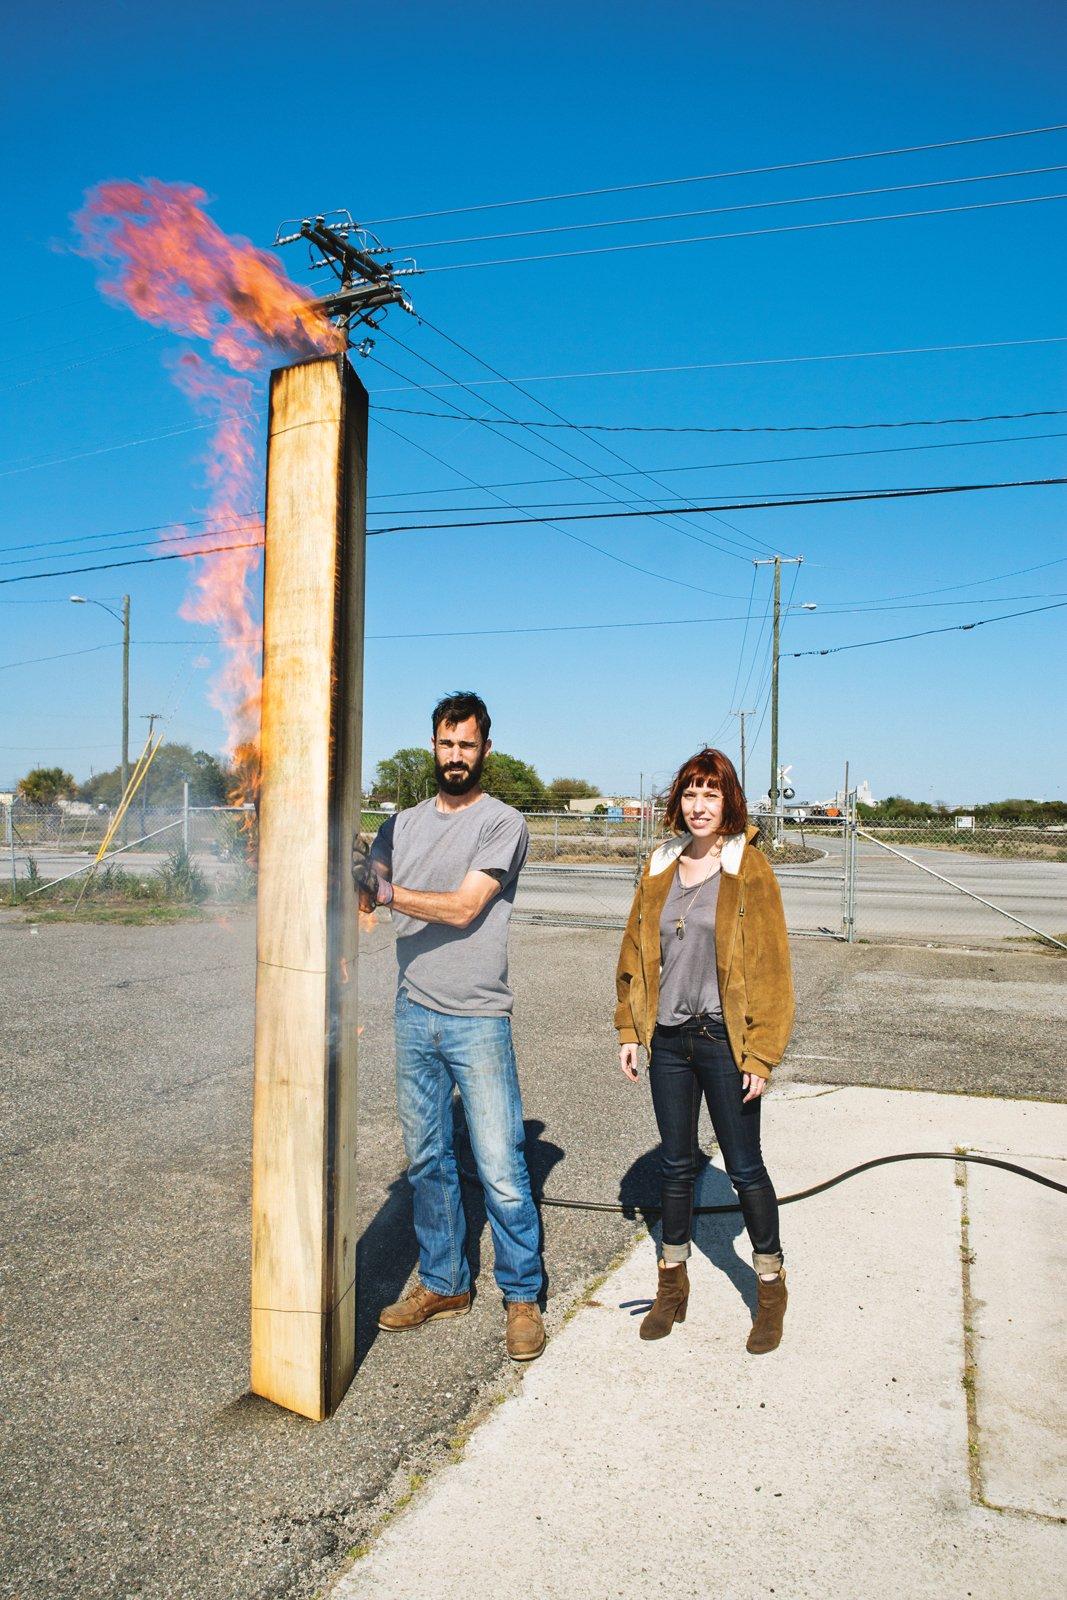 Michael James Moran and Celia Gibson demonstrate shou-sugi-ban, a Japanese wood burning technique.